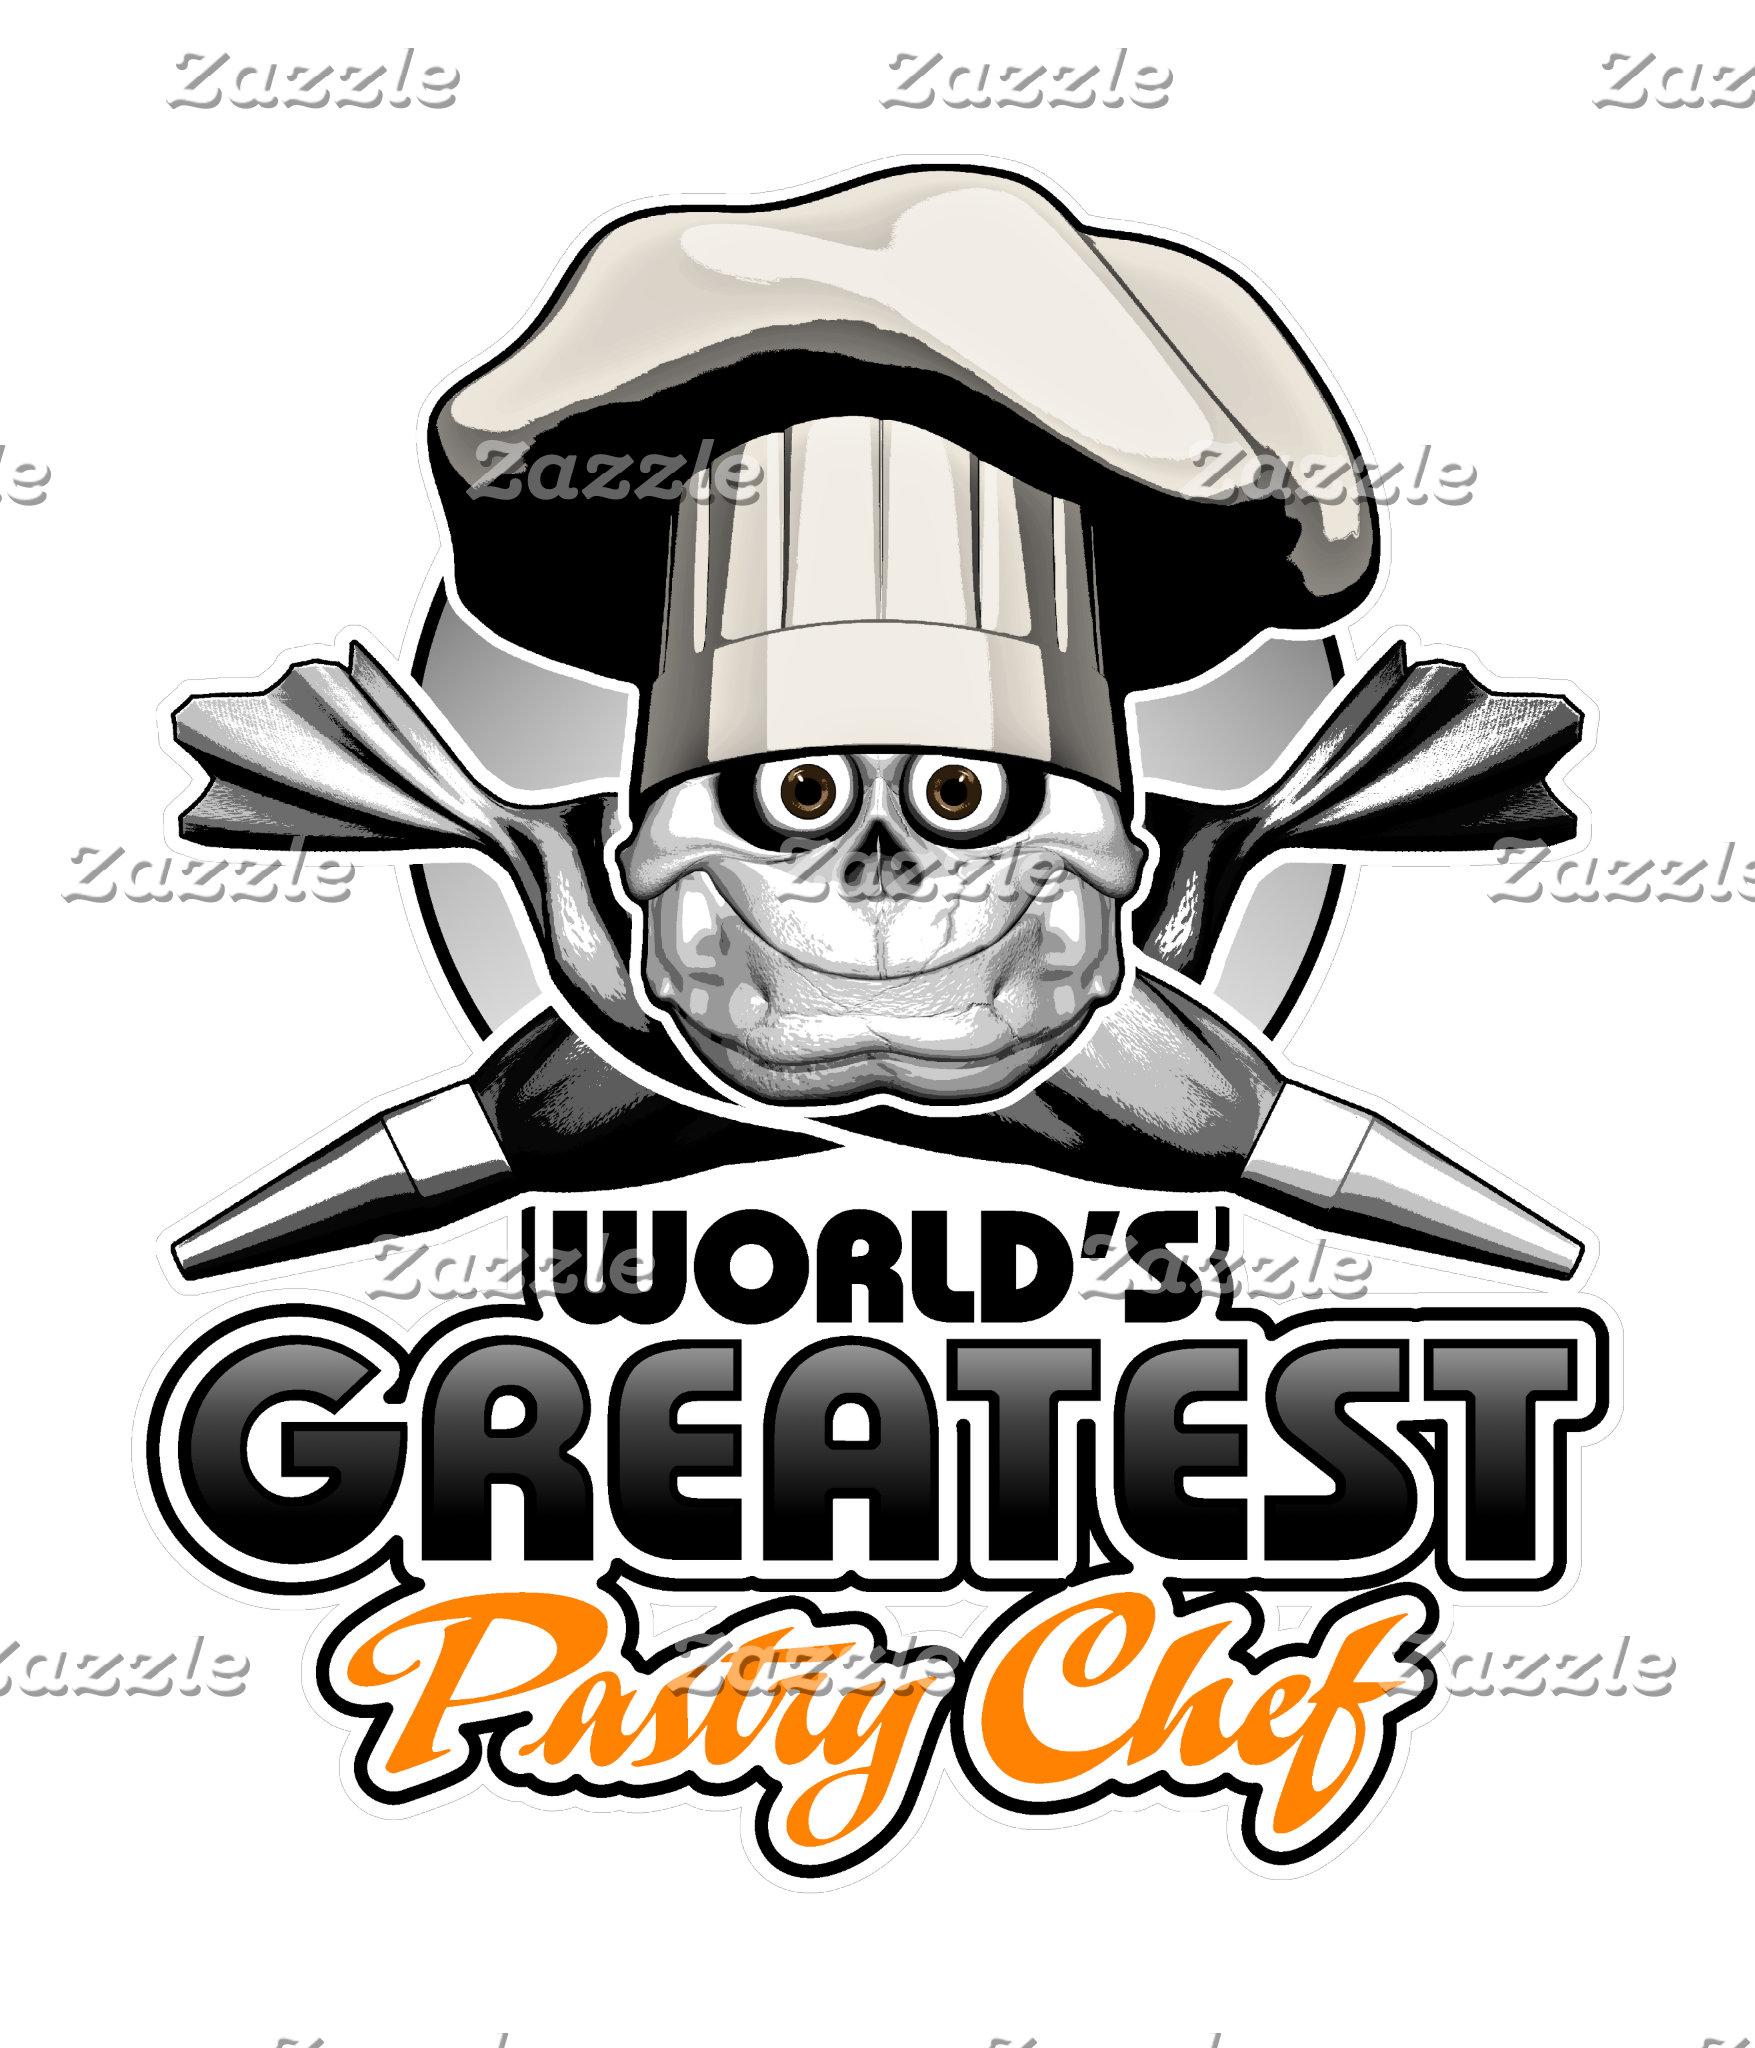 World's Greatest Pastry Chef v2